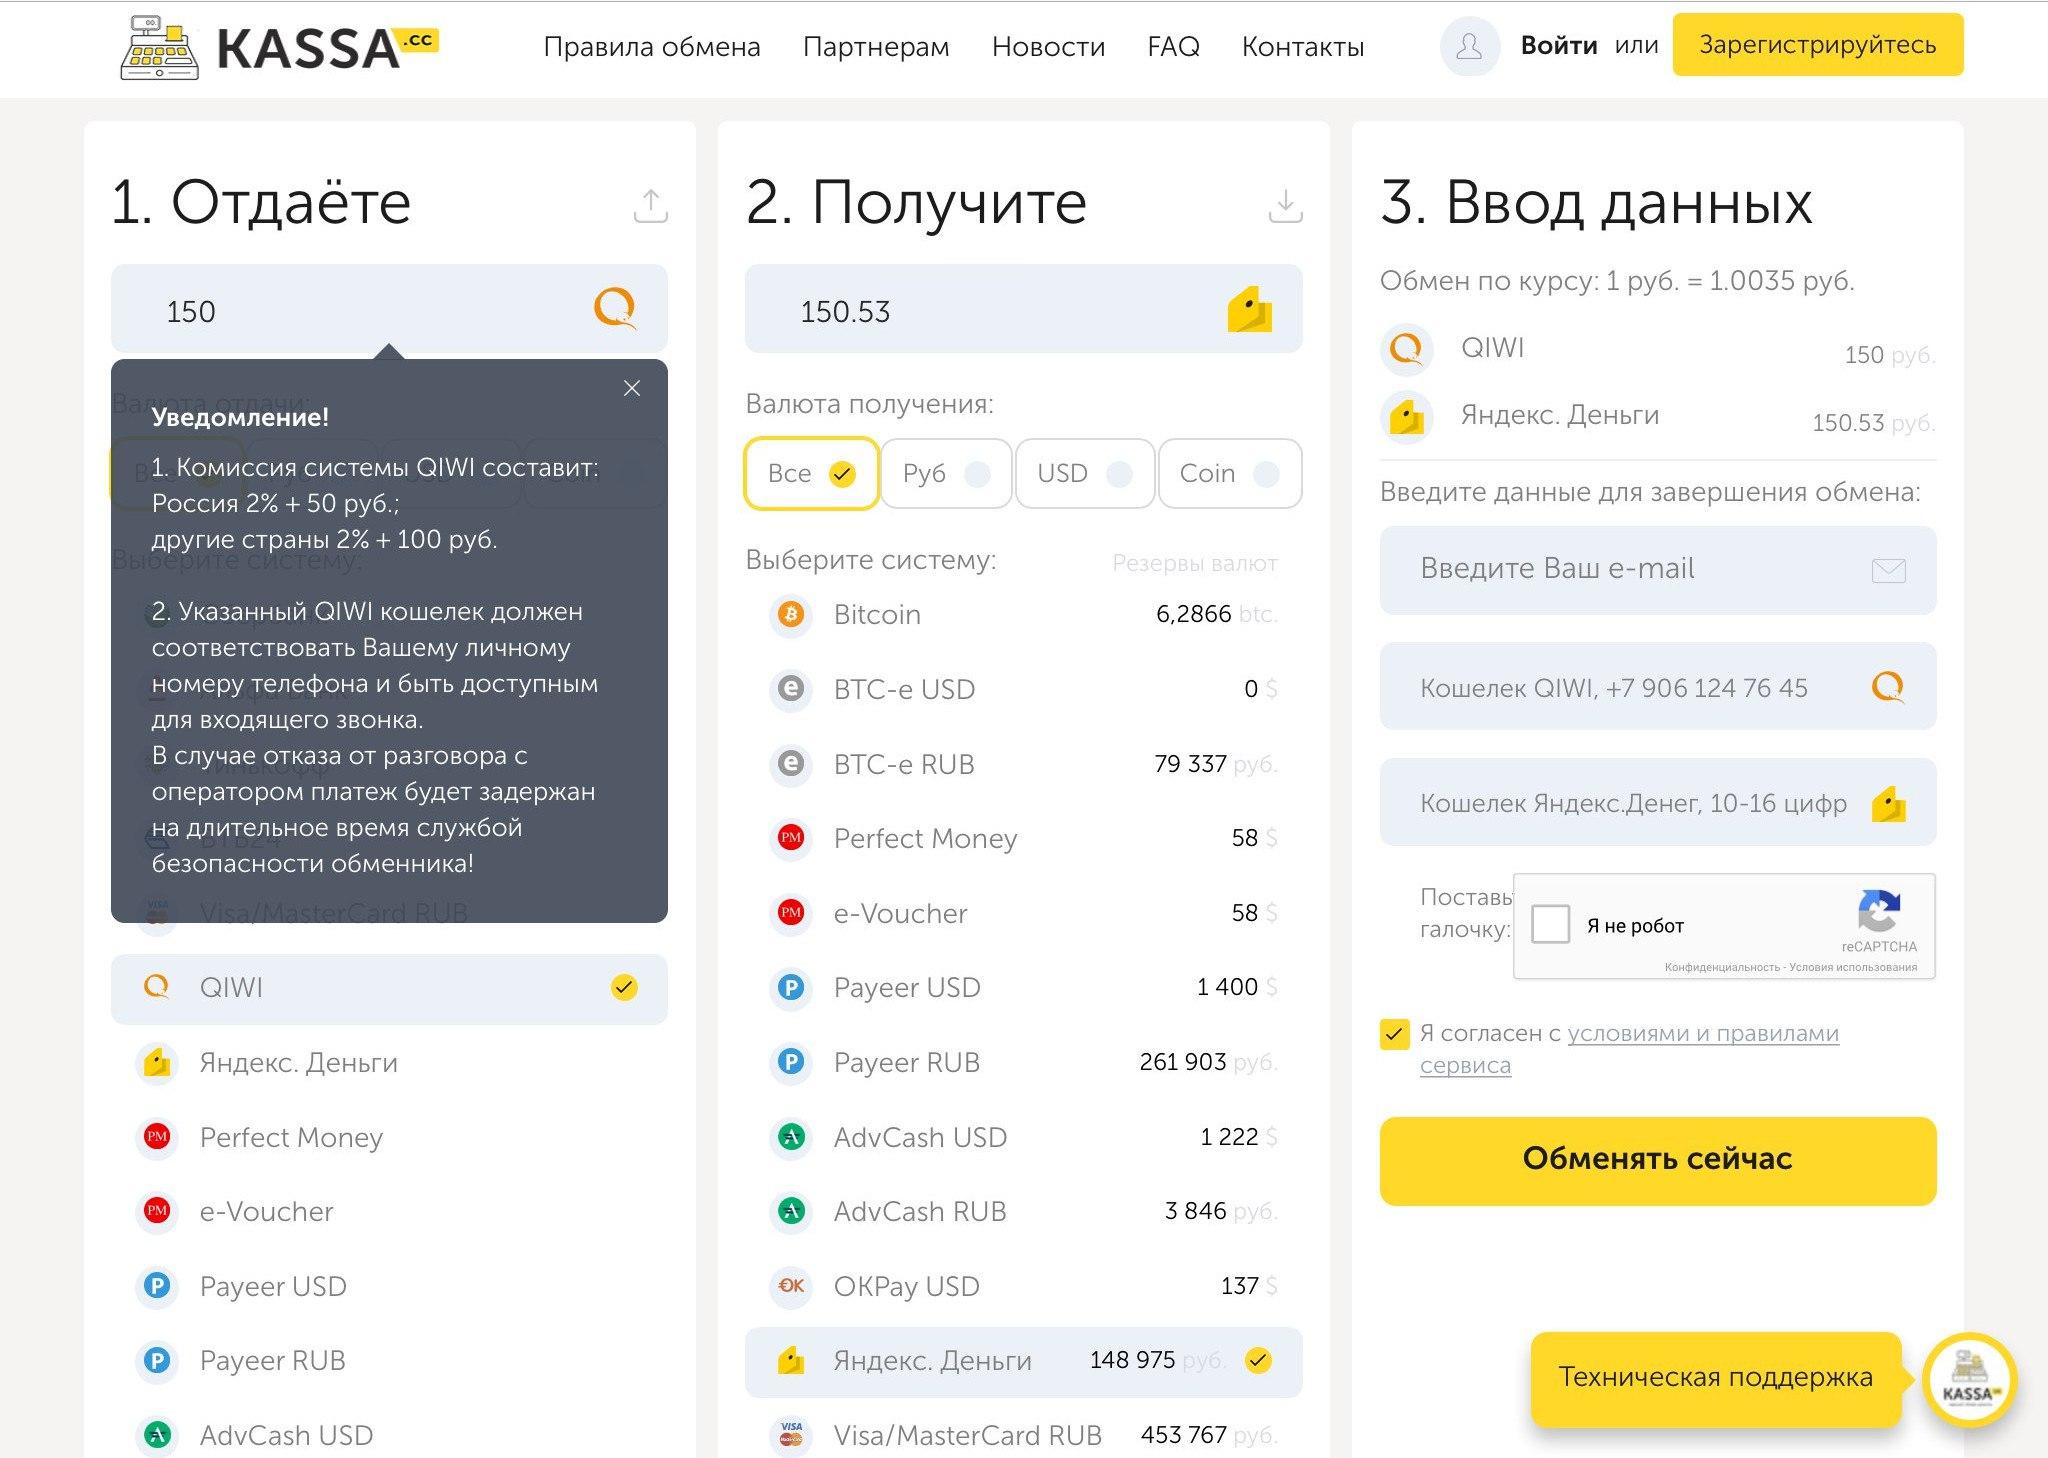 Kassa.cc - единый обмен валюты. Обмен QIWI RUB на Яндекс.Деньги